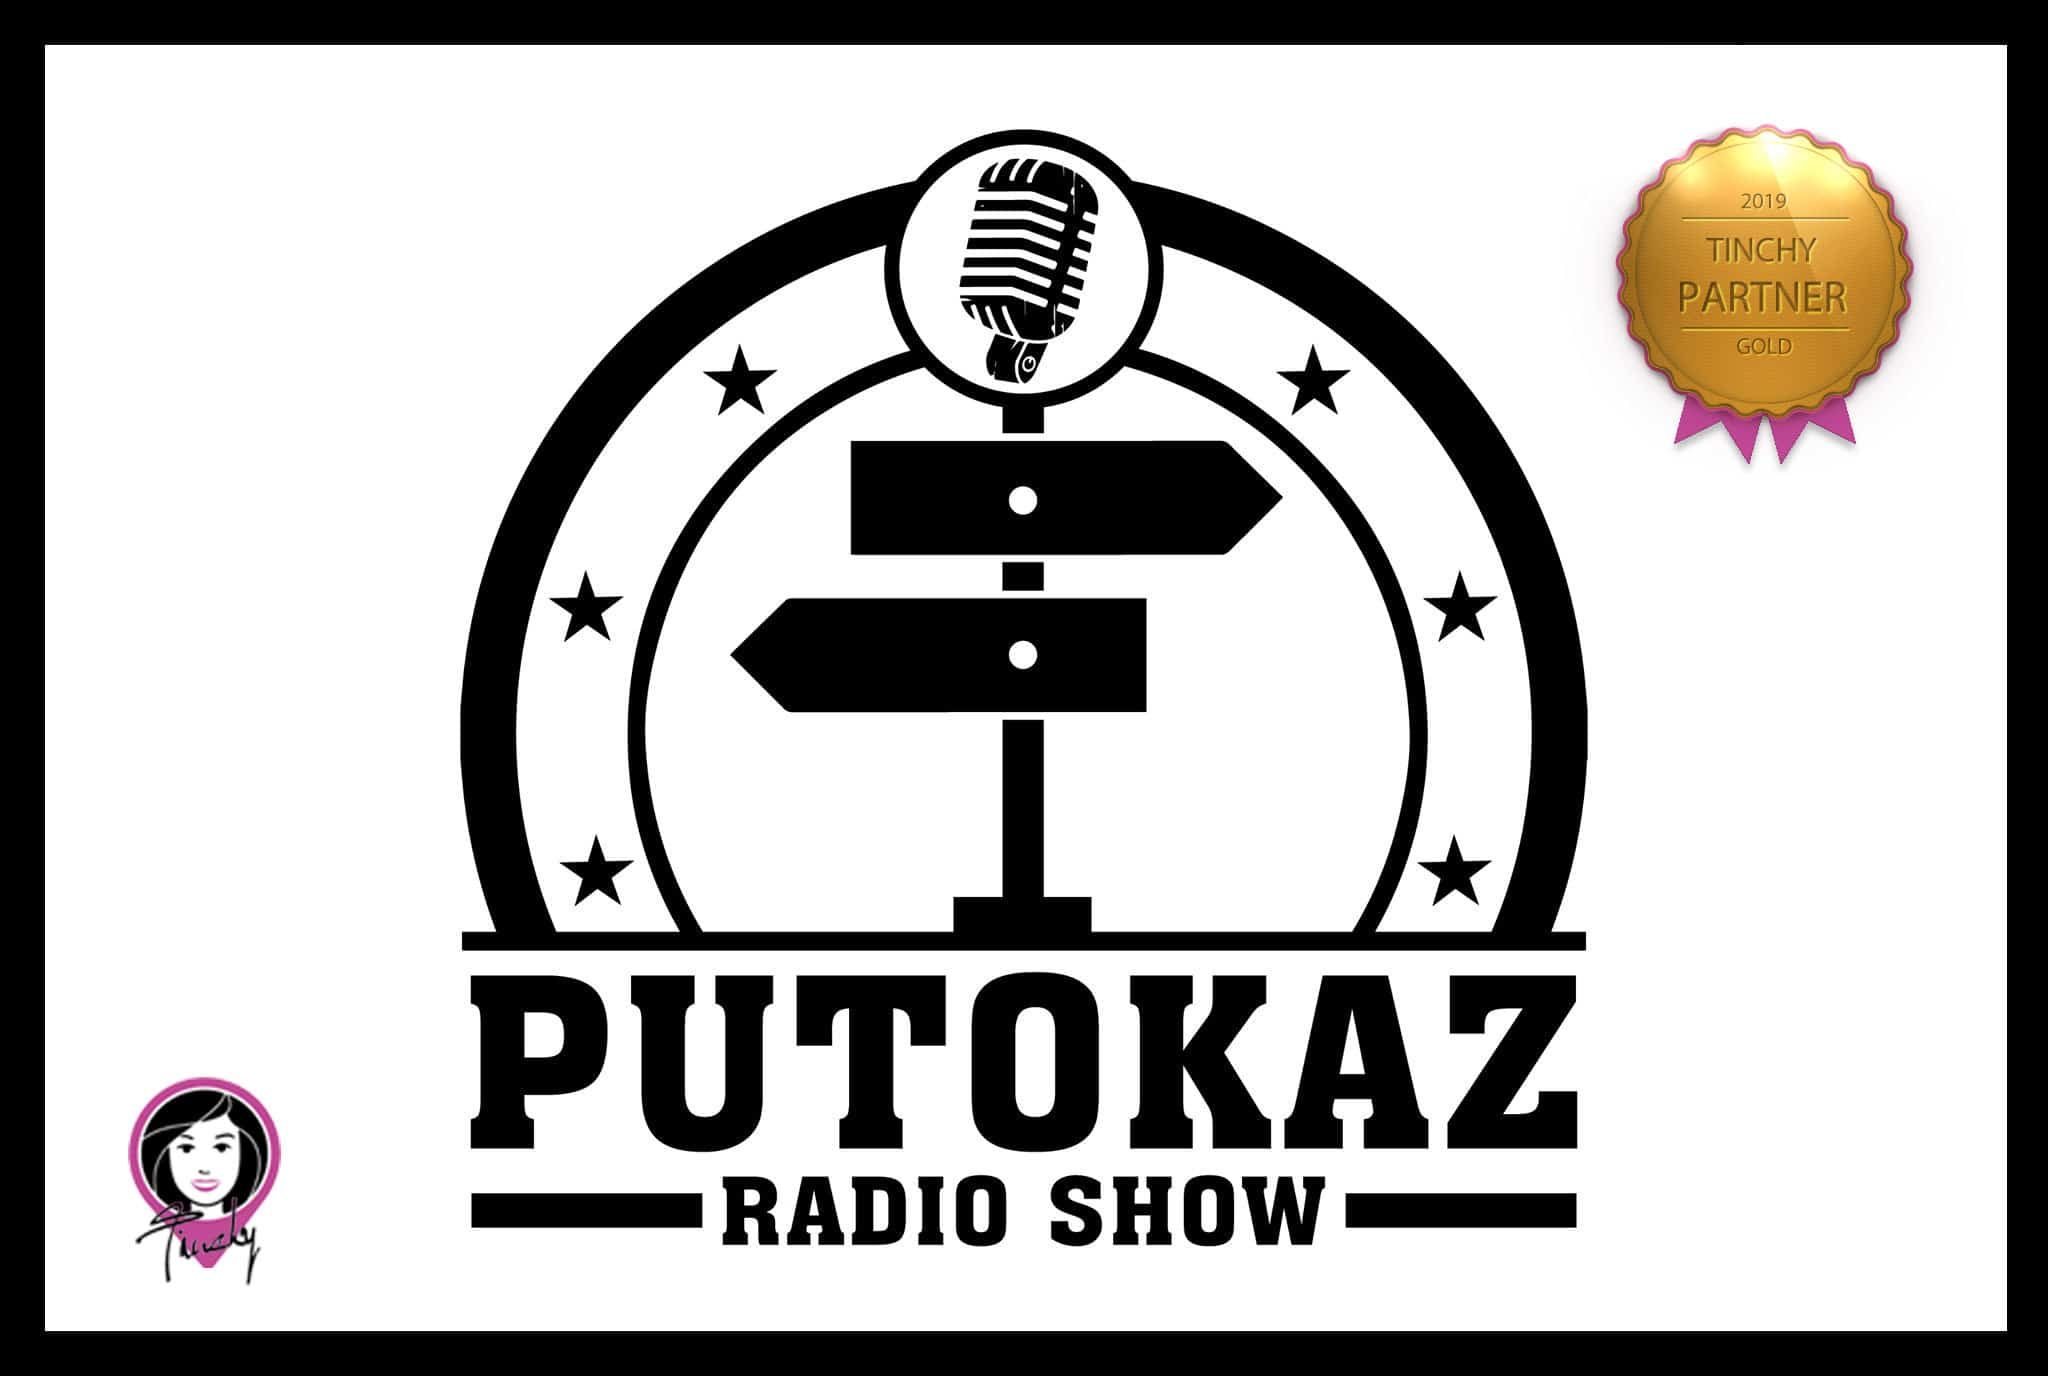 07.08.2020 – Radio emisija Putokaz